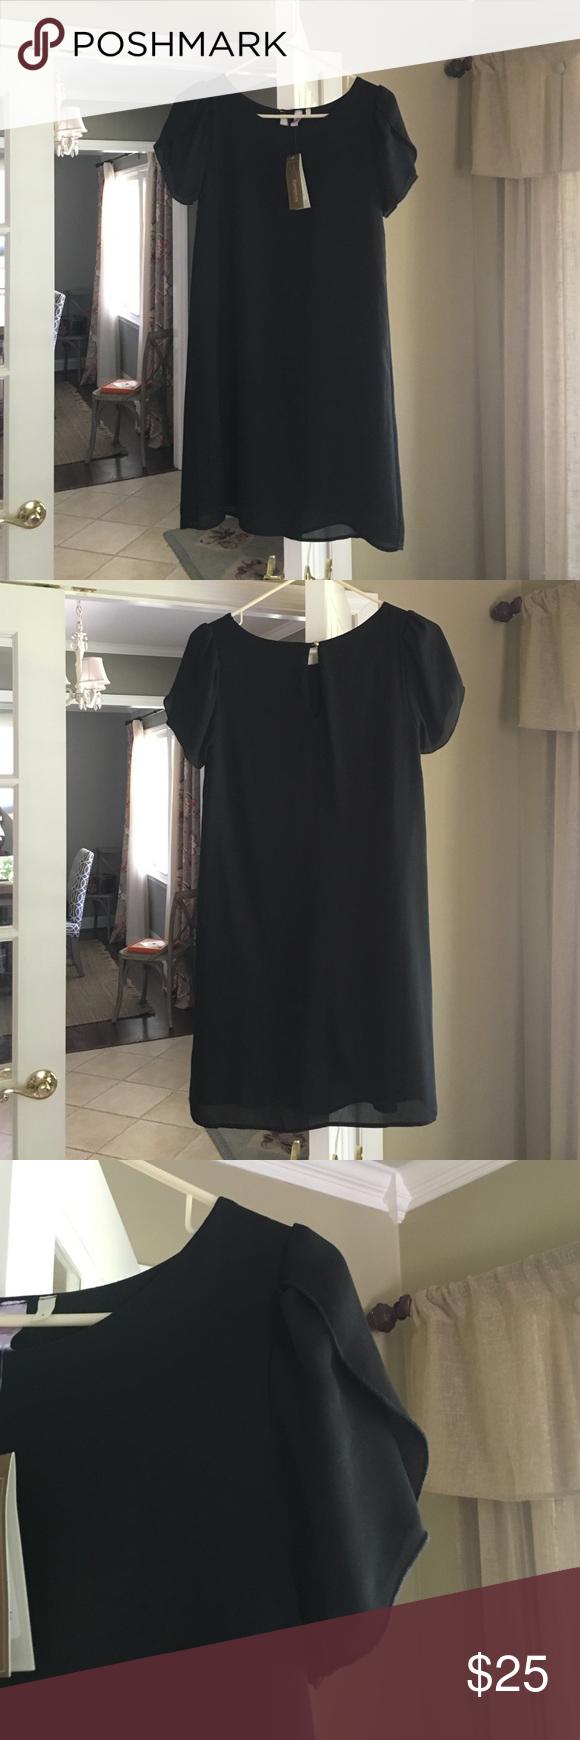 Francesca's black shift dress Black shift dress, key hole back closure, flattering sleeves! Never been worn! Francesca's Collections Dresses Mini